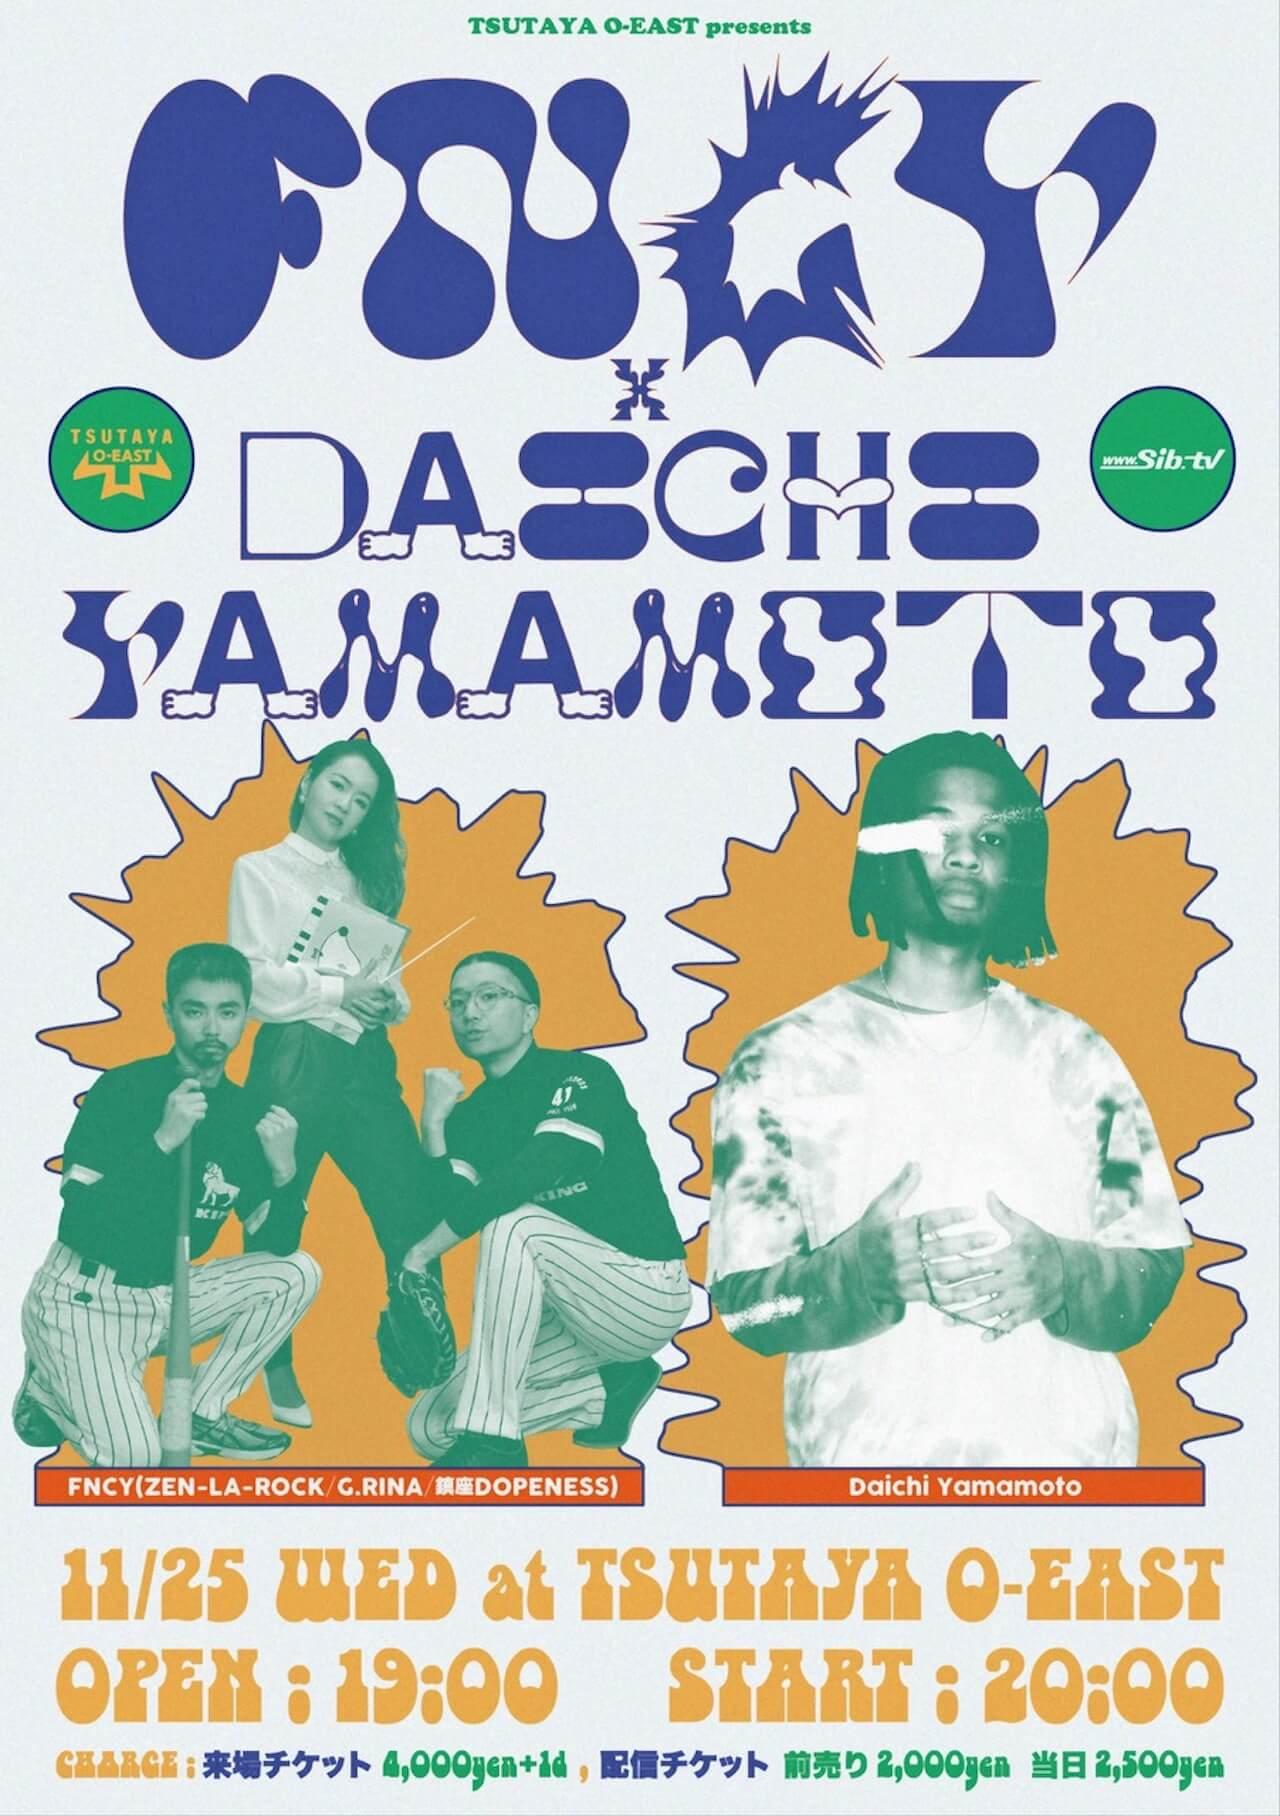 "FNCYとDaichi Yamamotoによる2マン公演が開催|アフターパーティーにはgrooveman Spot、原島""ど真ん中""宙芳らが登場 music201115-fncy-daichi-yamamoto-3"